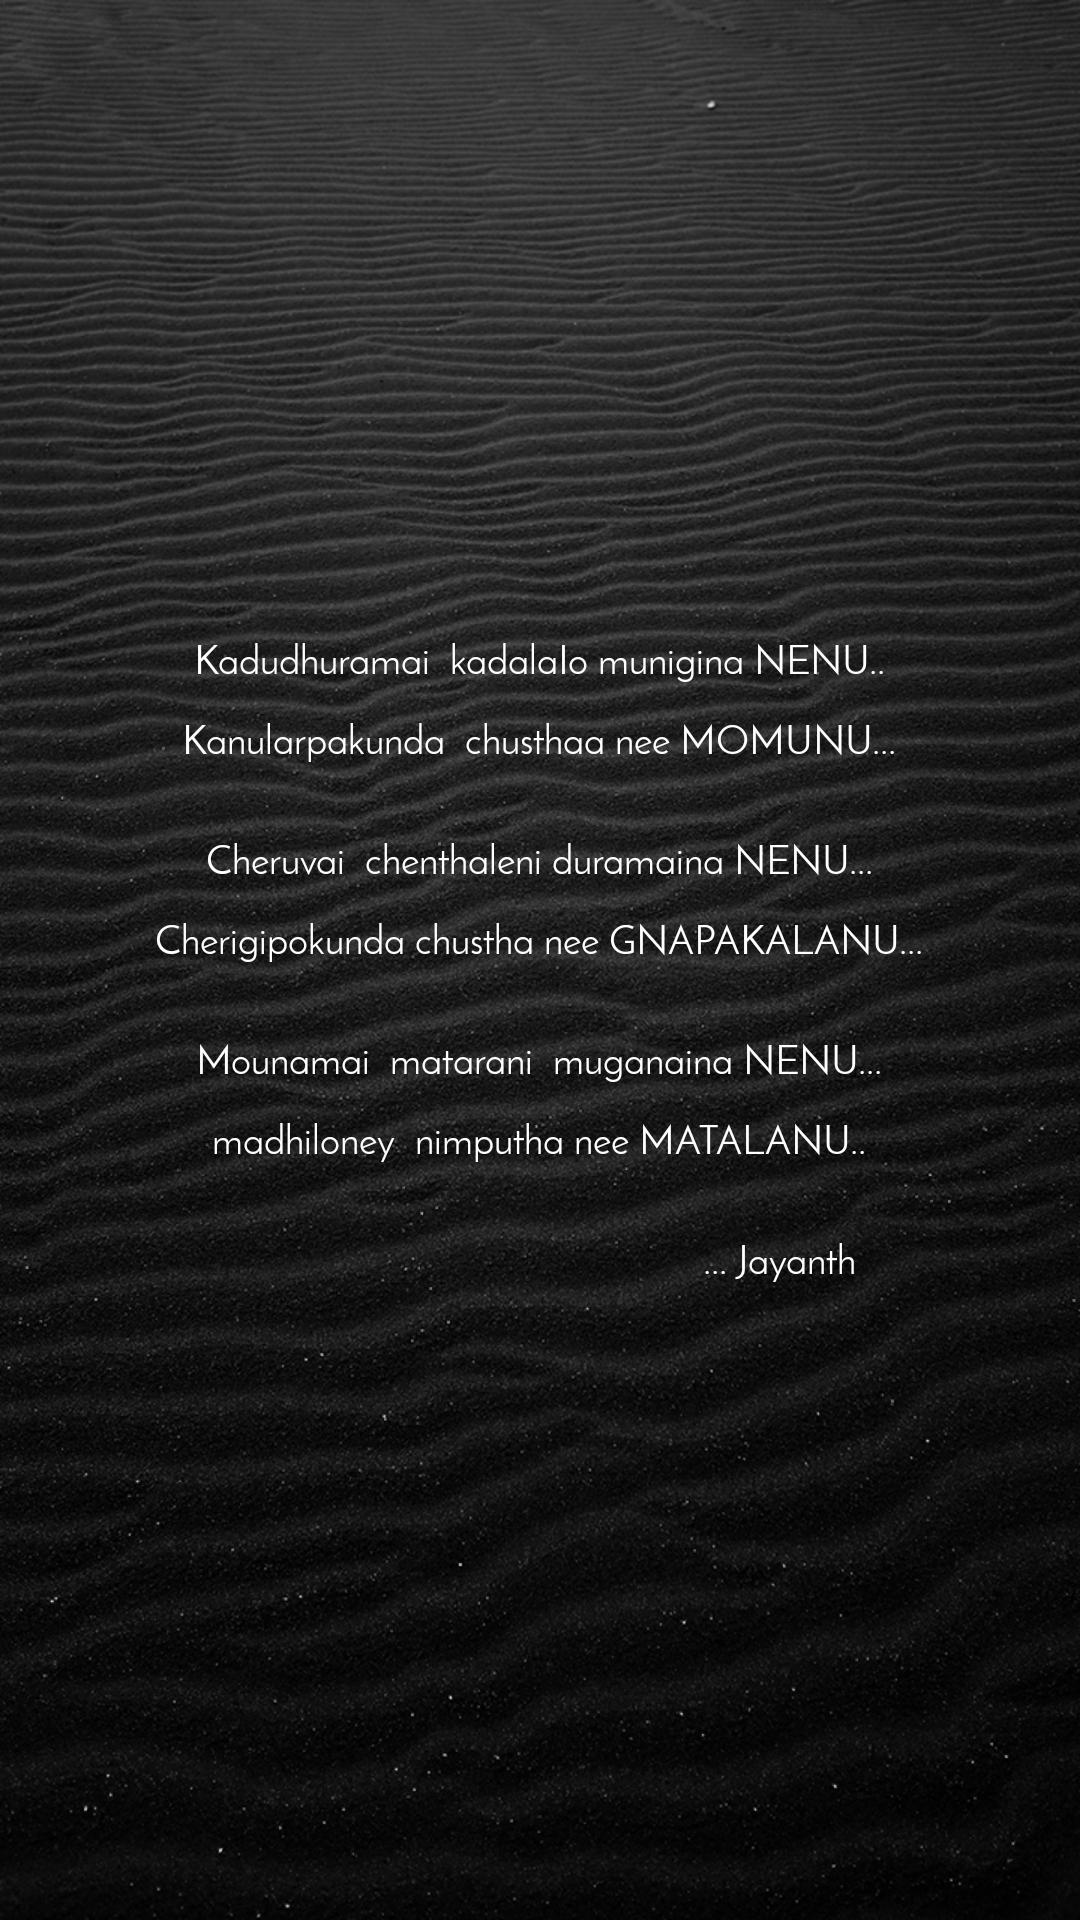 Kadudhuramai  kadalaIo munigina NENU..  Kanularpakunda  chusthaa nee MOMUNU...   Cheruvai  chenthaleni duramaina NENU...  Cherigipokunda chustha nee GNAPAKALANU...   Mounamai  matarani  muganaina NENU...  madhiloney  nimputha nee MATALANU..                                                   ... Jayanth